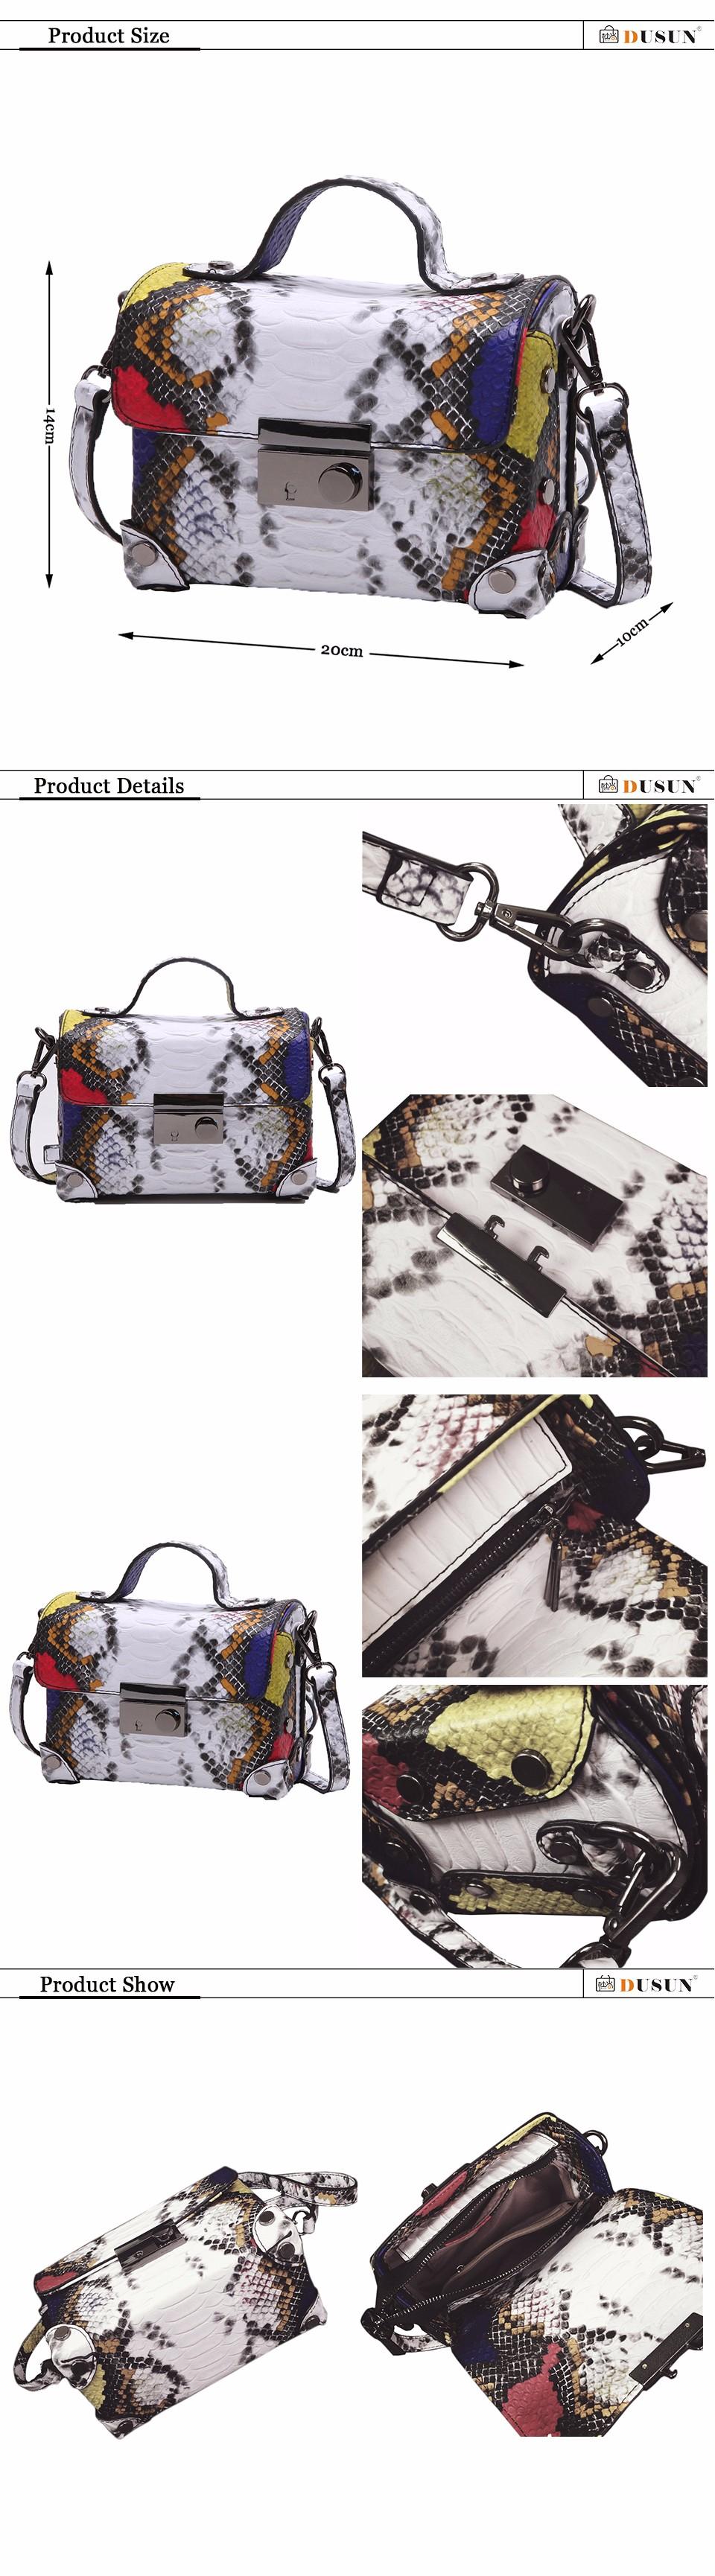 DUSUN Luxury Brands Messenger Bag Casual Women Bag Handbags Fashion Colorful Serpentine Tote Vintage Style Small Messenger Bag